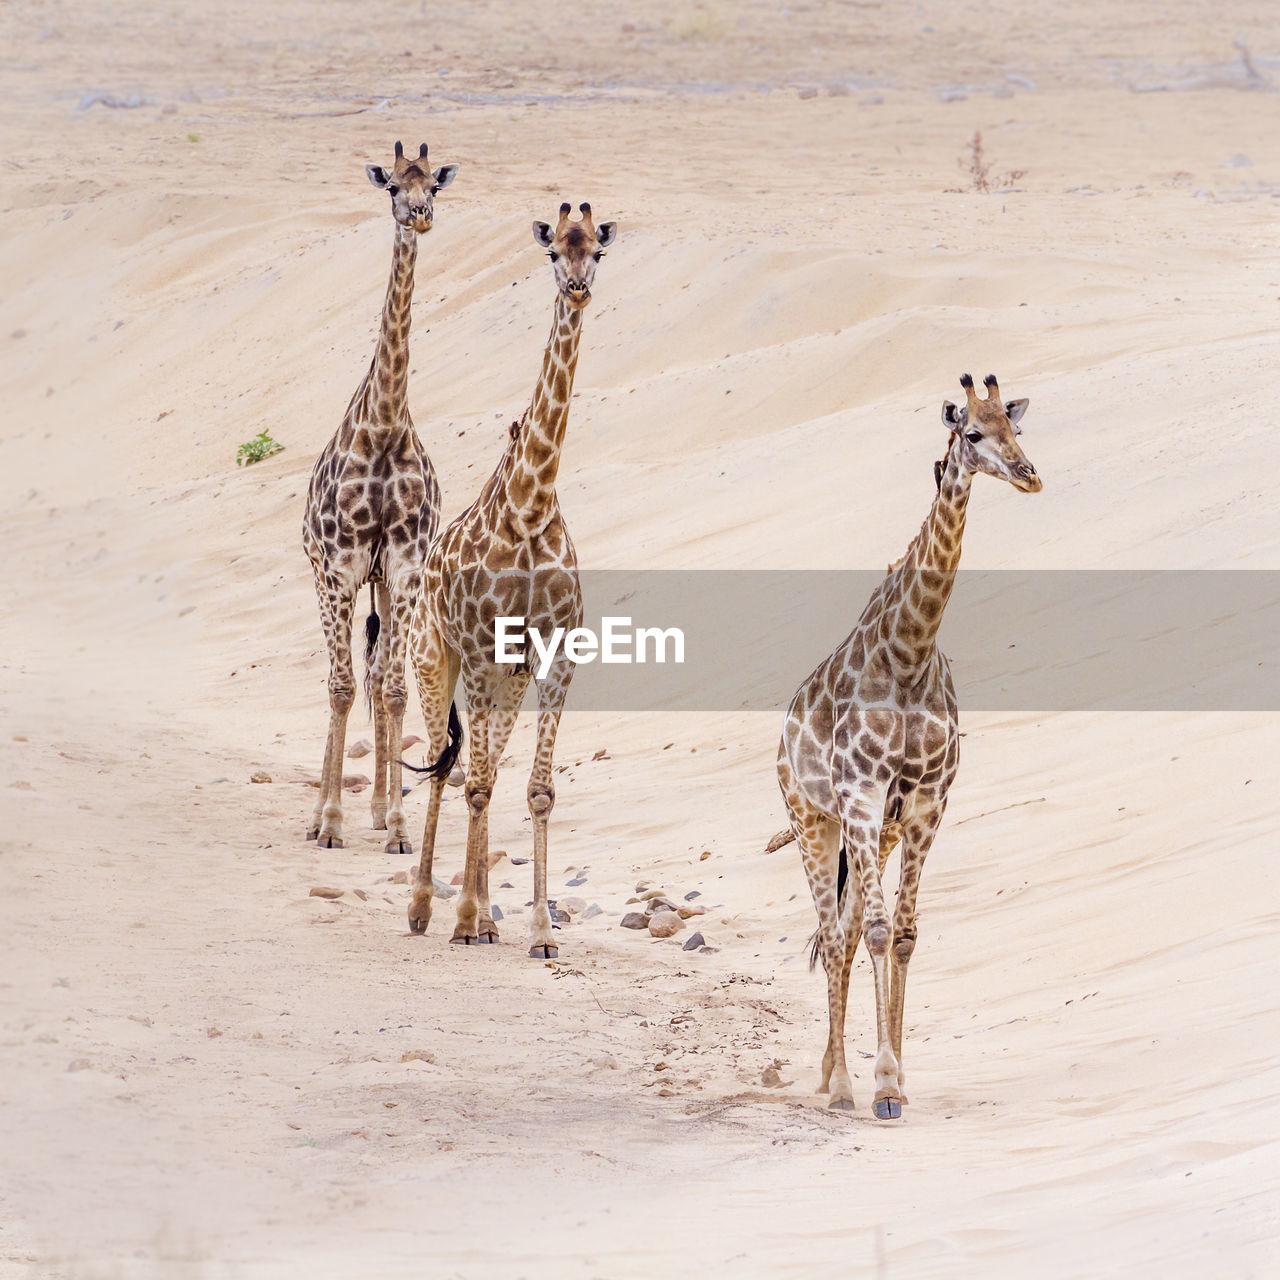 High angle view of giraffes walking on land